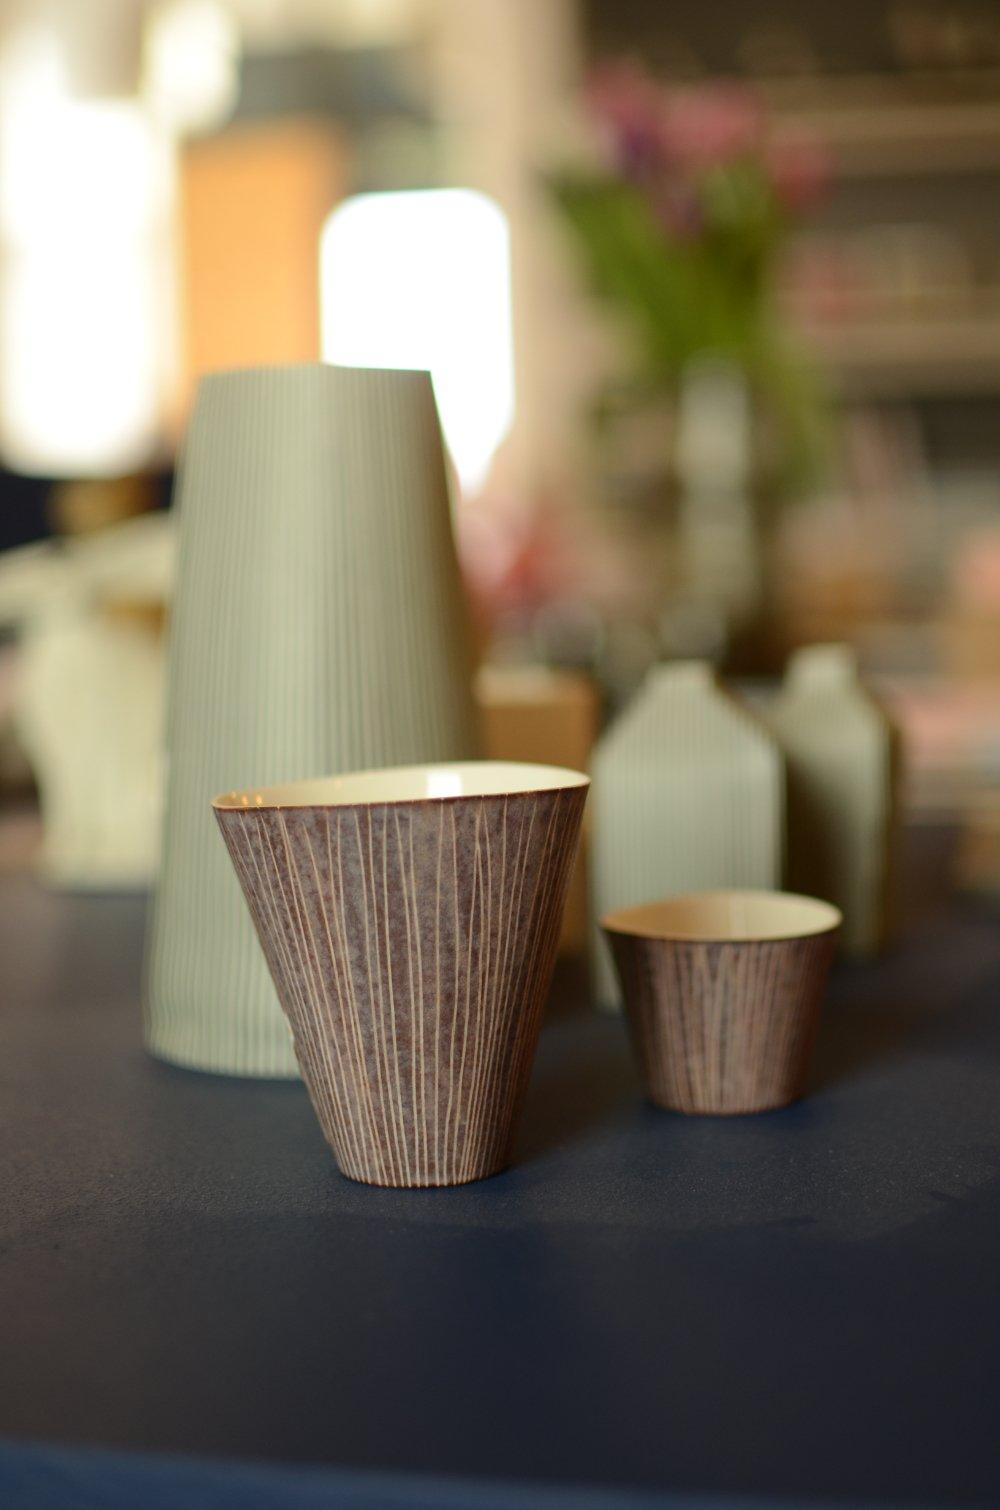 Tall, porceline vessels by Justine Allison